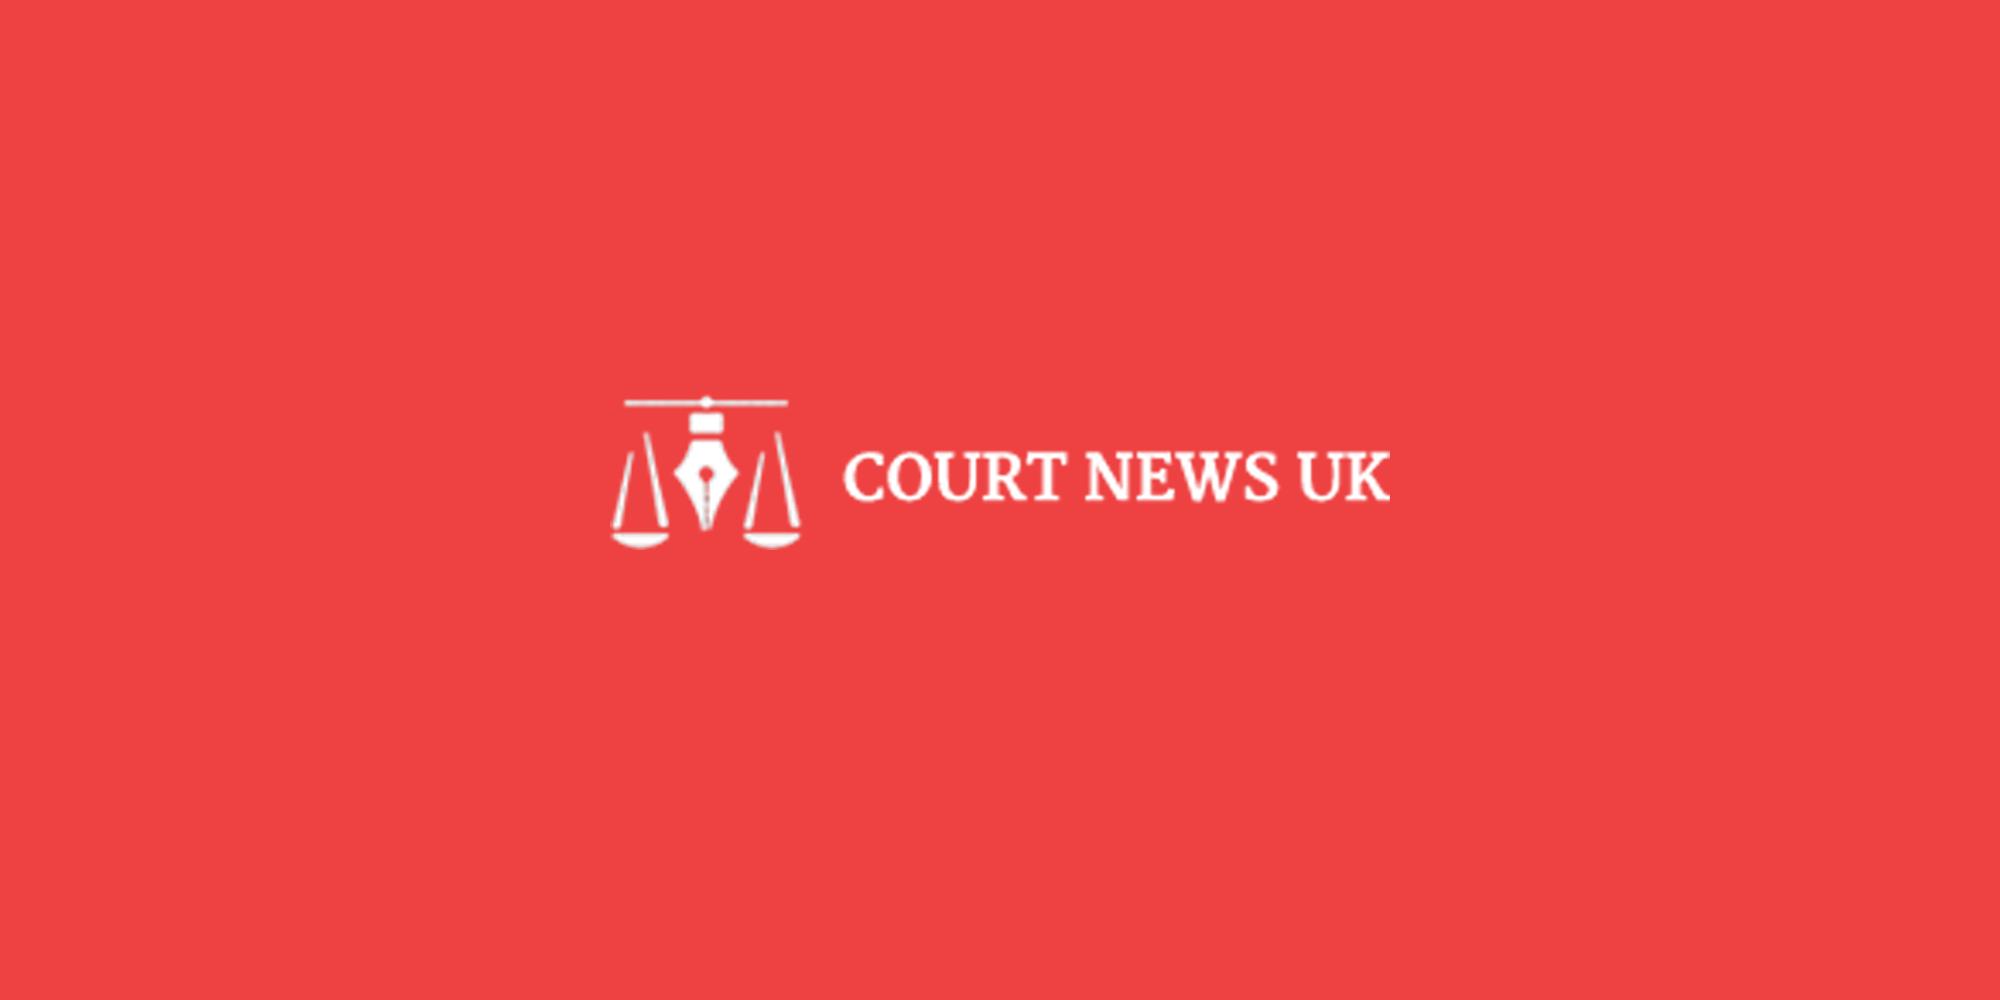 Court News UK